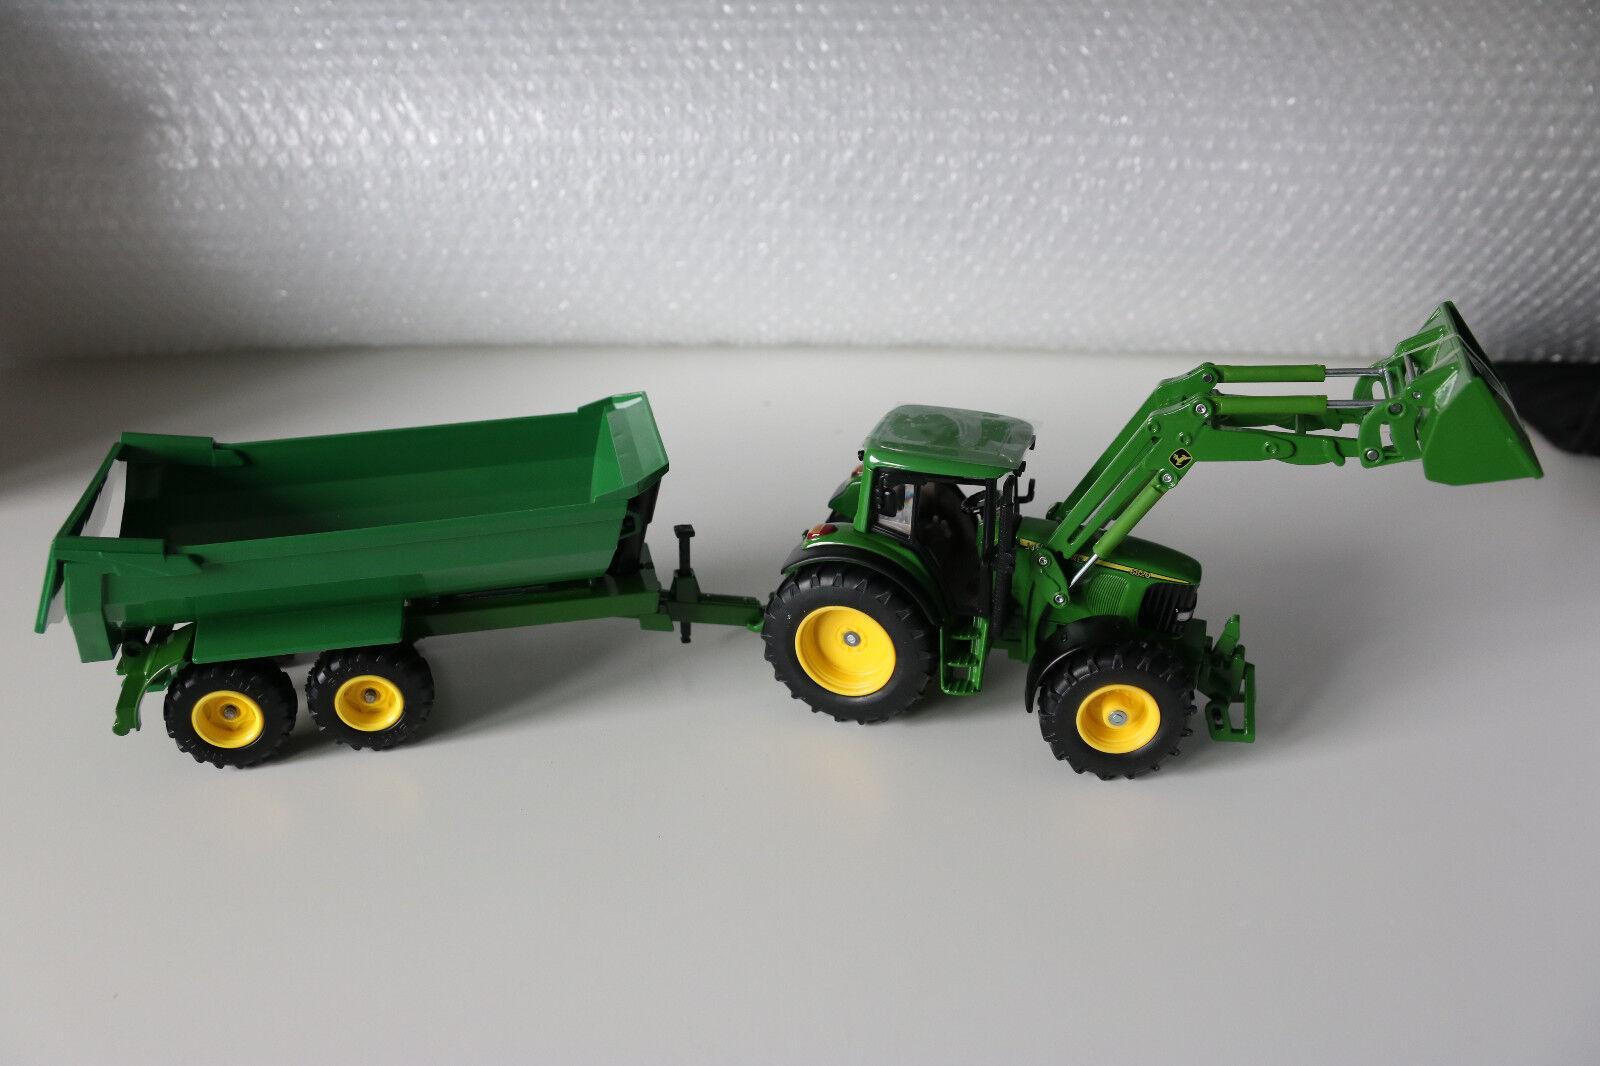 Siku Farmer  Traktor mit Frontlader Frontlader Frontlader u. Muldenkipper  1 32 OVP   3+  Metall u.Pl. b1faac